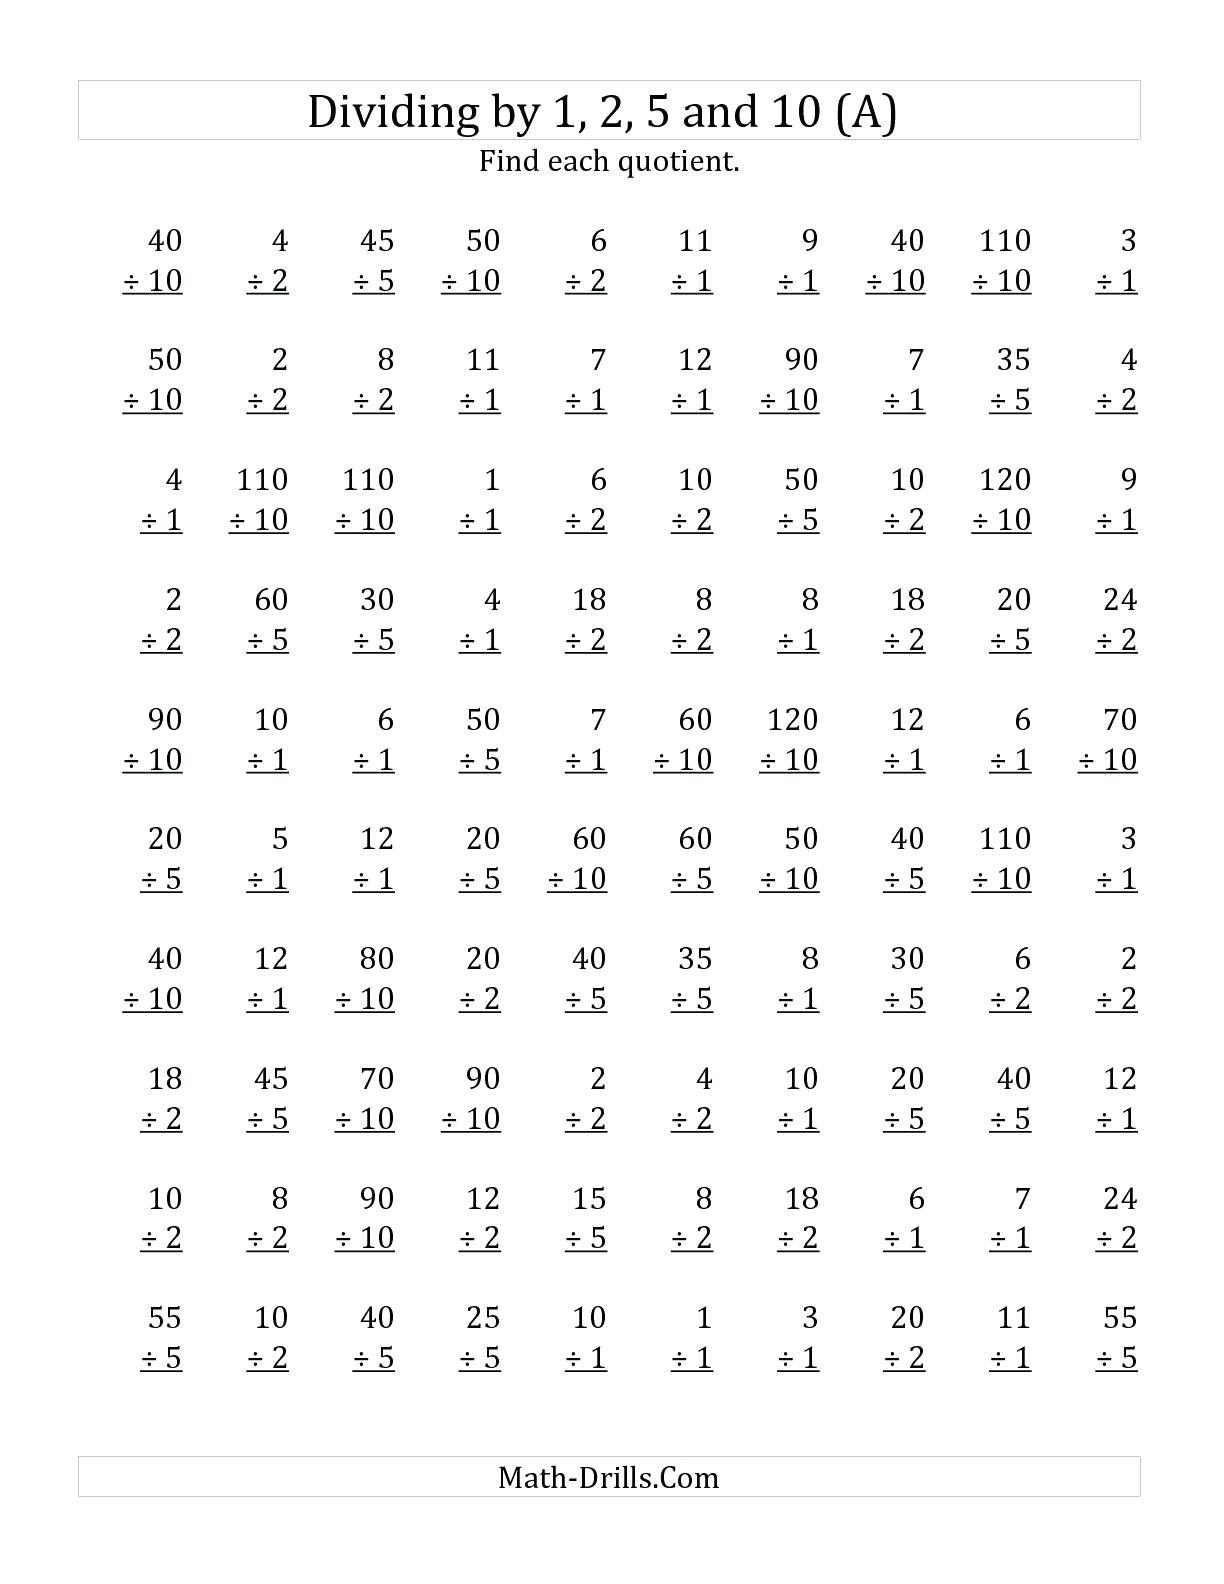 Basic Math Timed Test Worksheet | Printable Worksheets And regarding Free Printable Multiplication Quiz 0-12